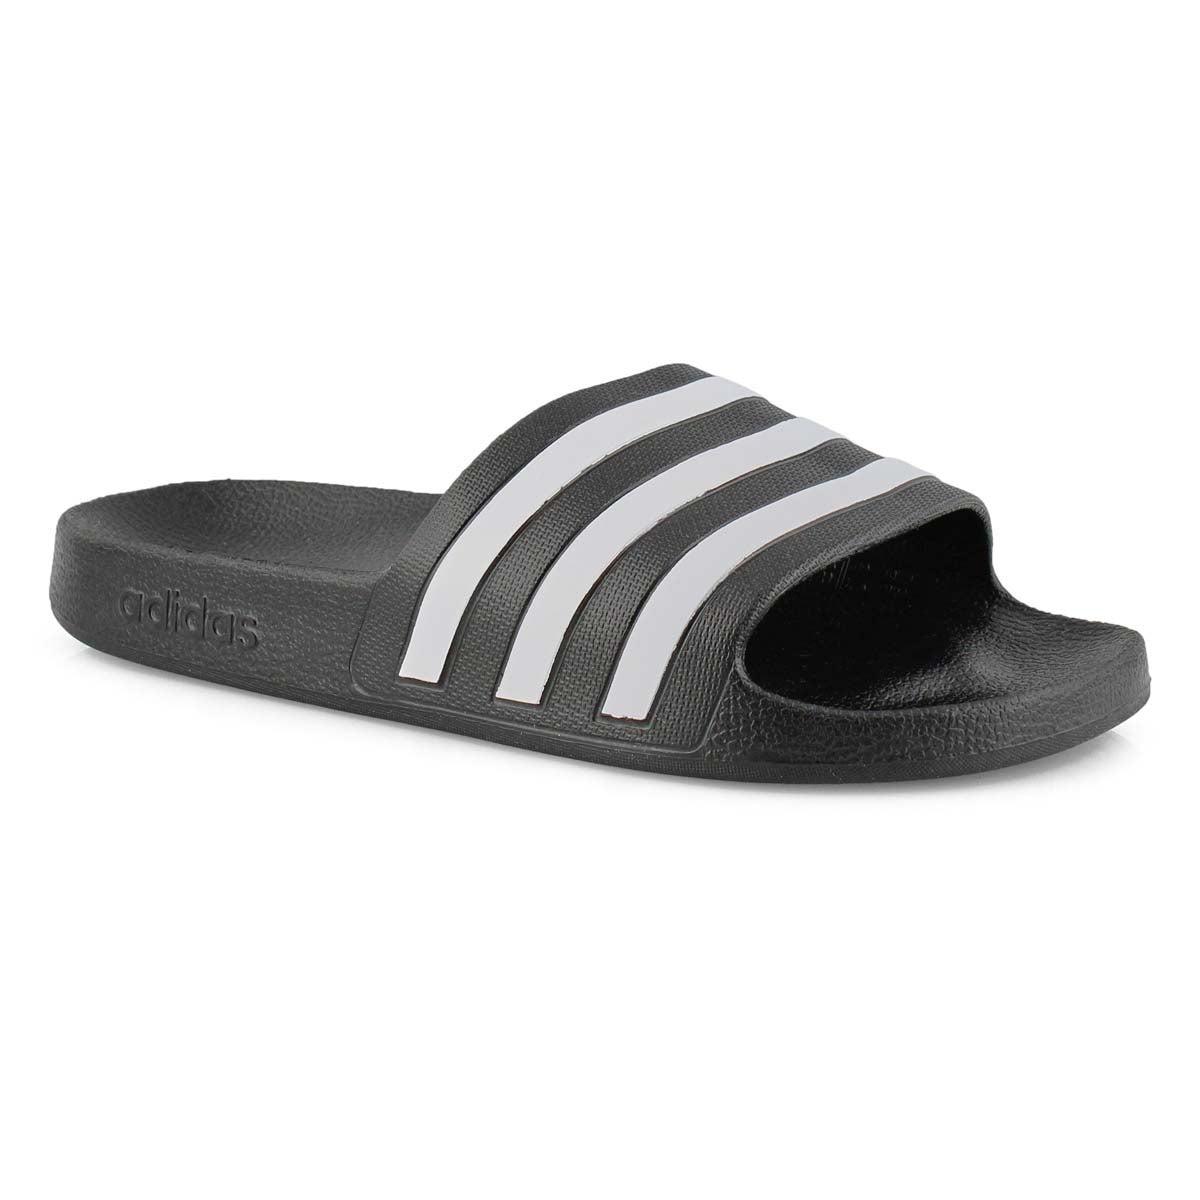 Lds Adilette Aqua blk/wht slide sandal